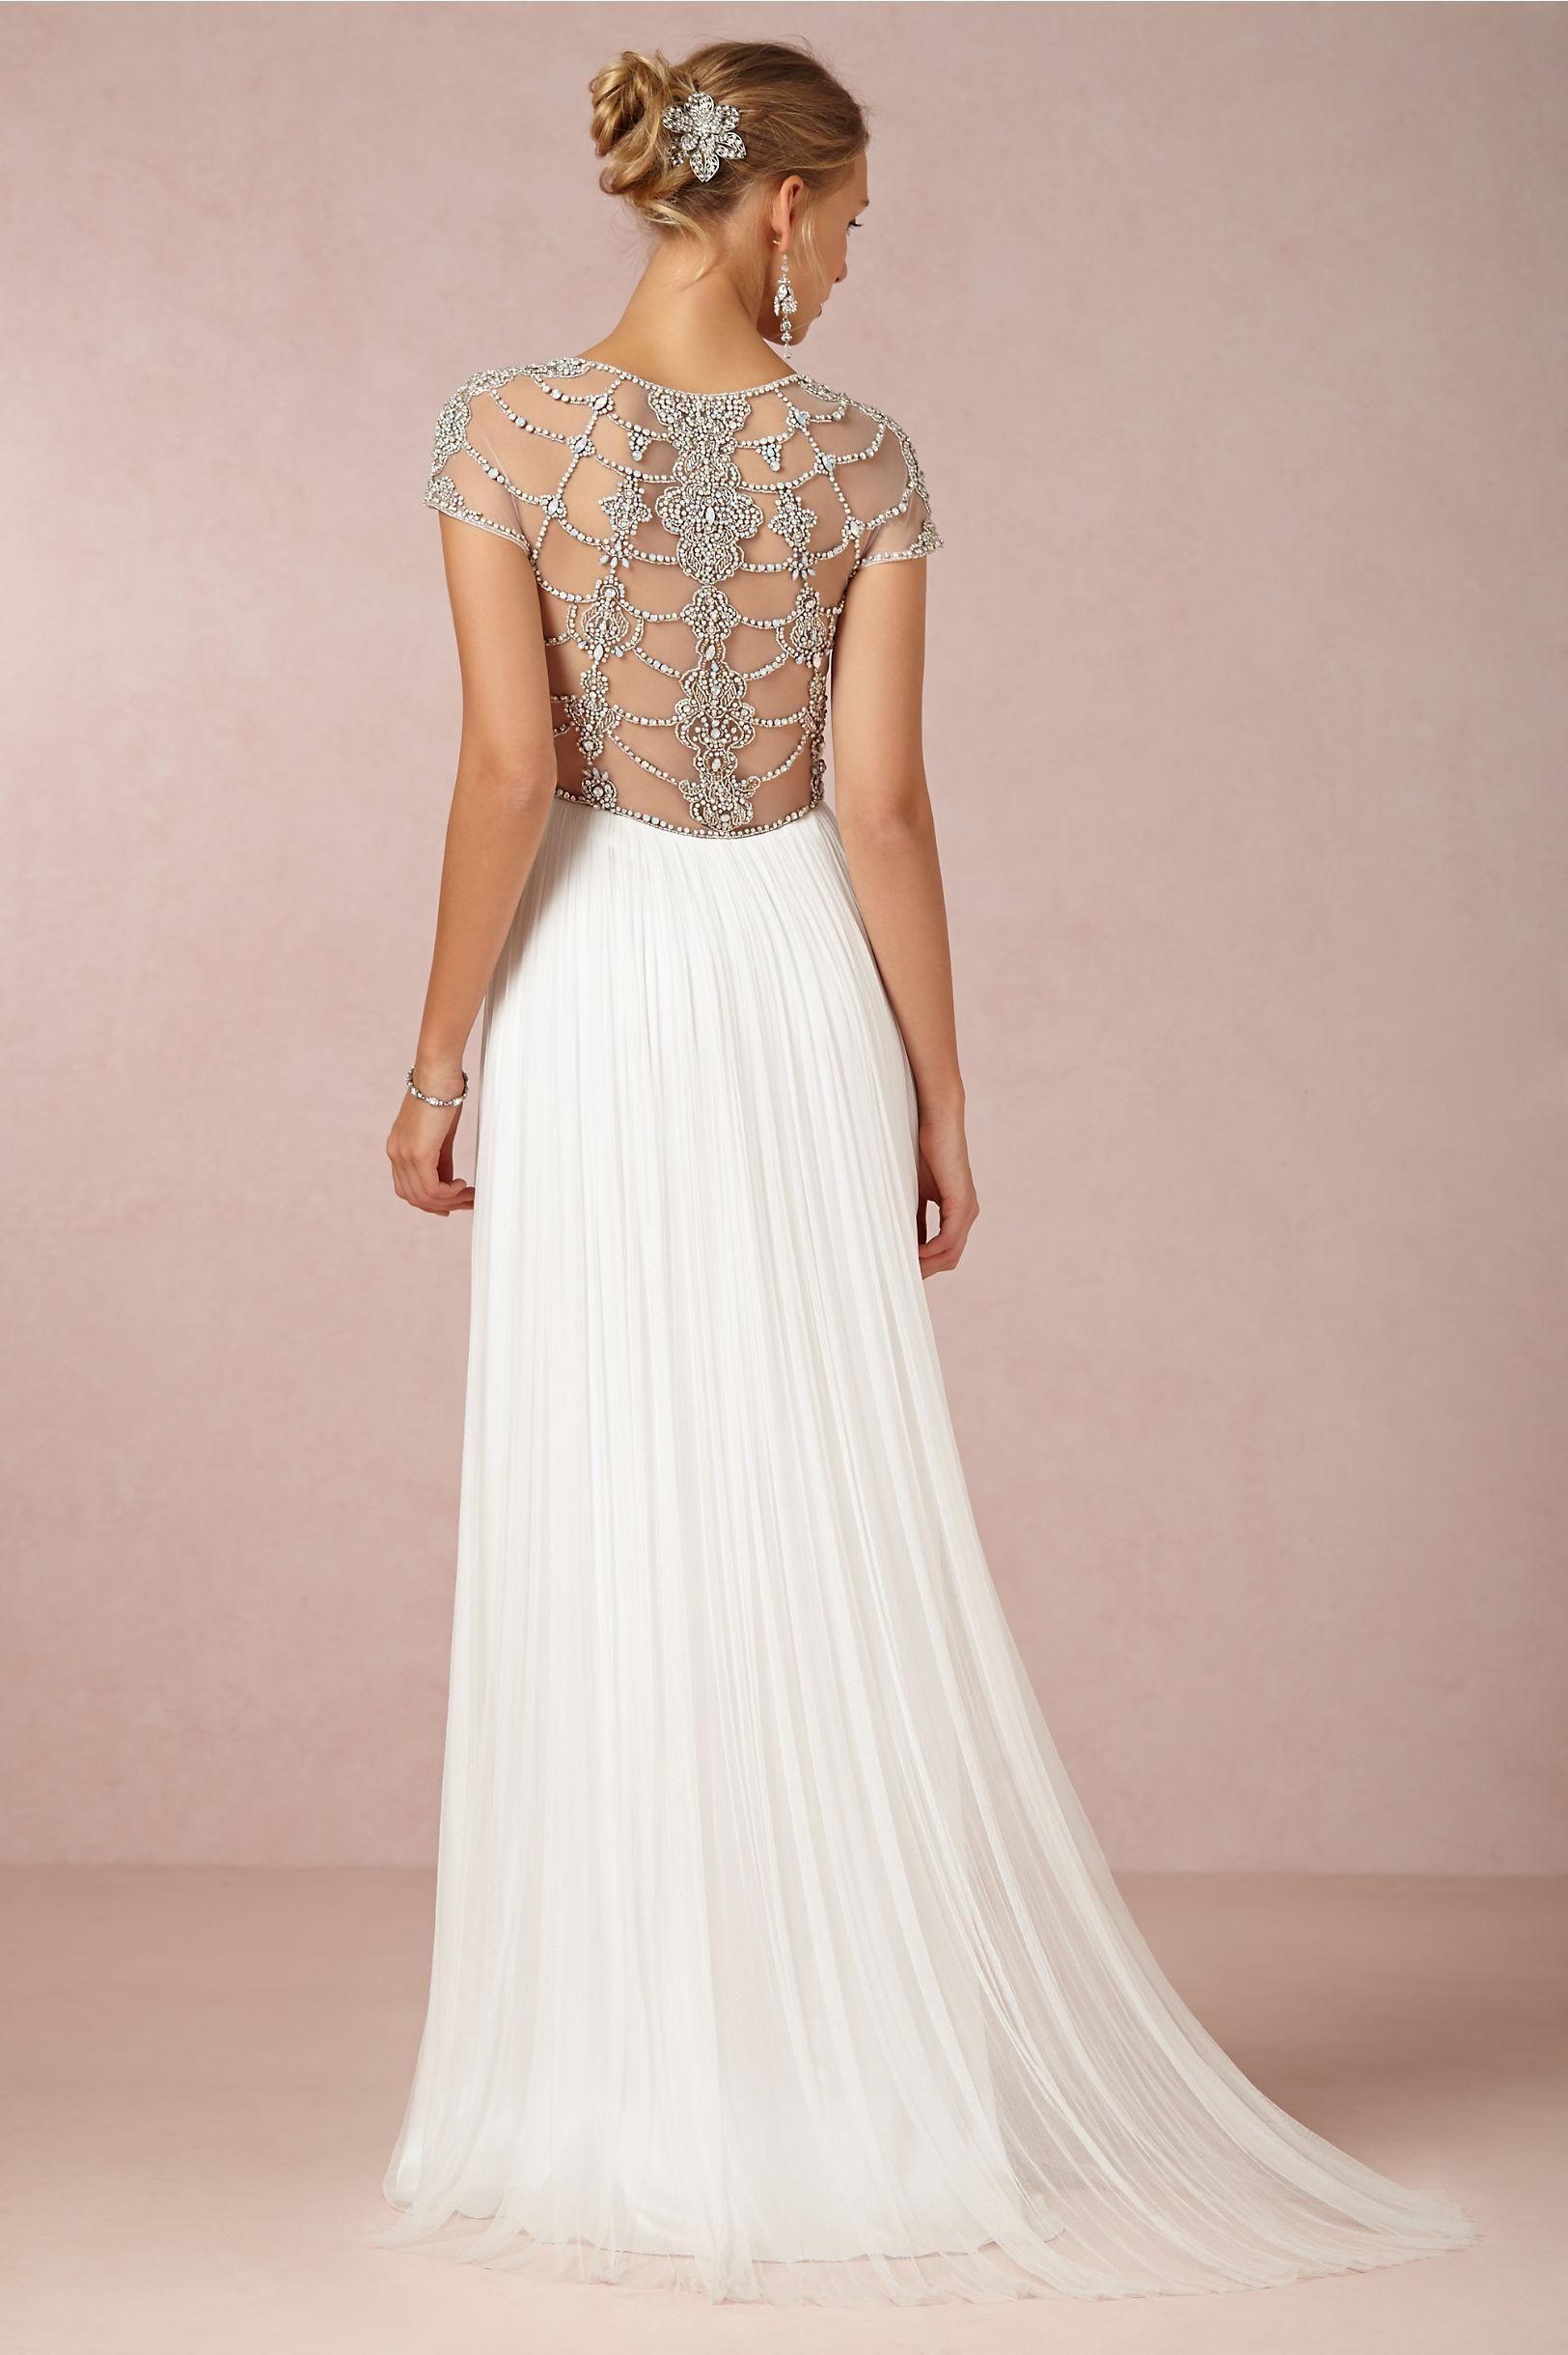 Tallulah Gown By Catherine Deane For Bhldn Wedding Dress Backs